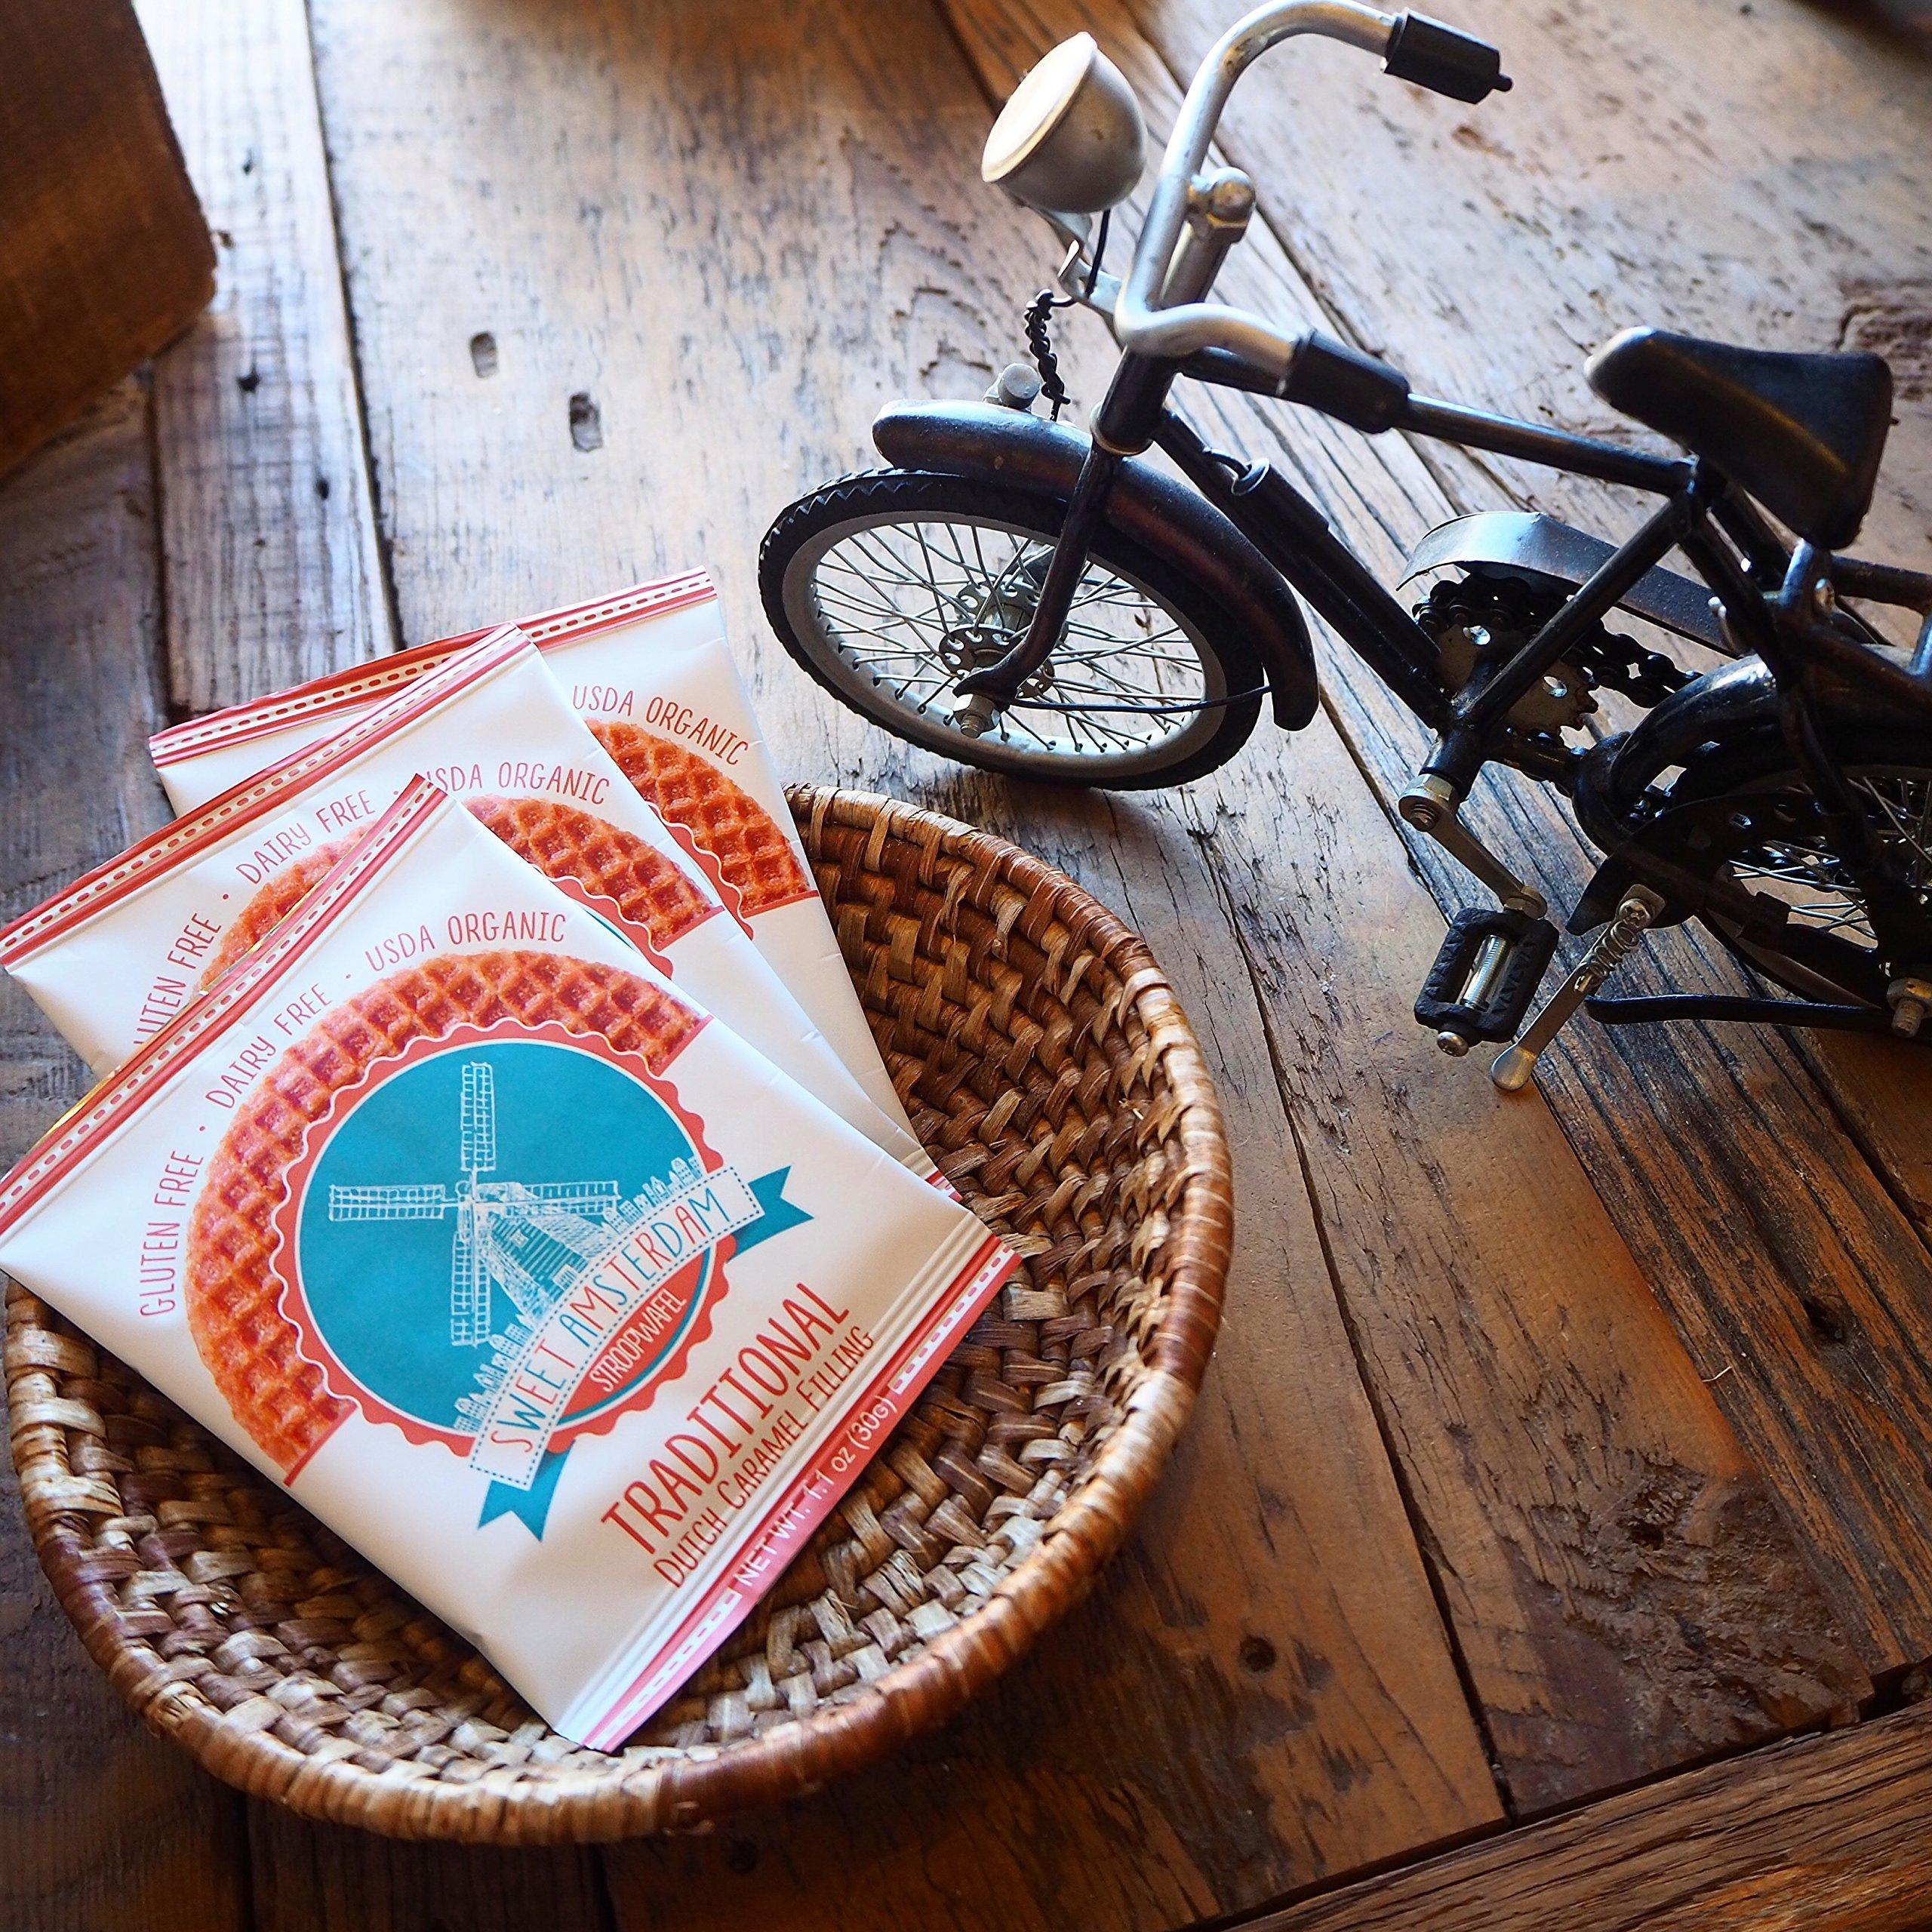 Sweet Amsterdam Organic & Gluten Free Stroopwafel Snacks, Caramel, 12 Count by Sweet Amsterdam